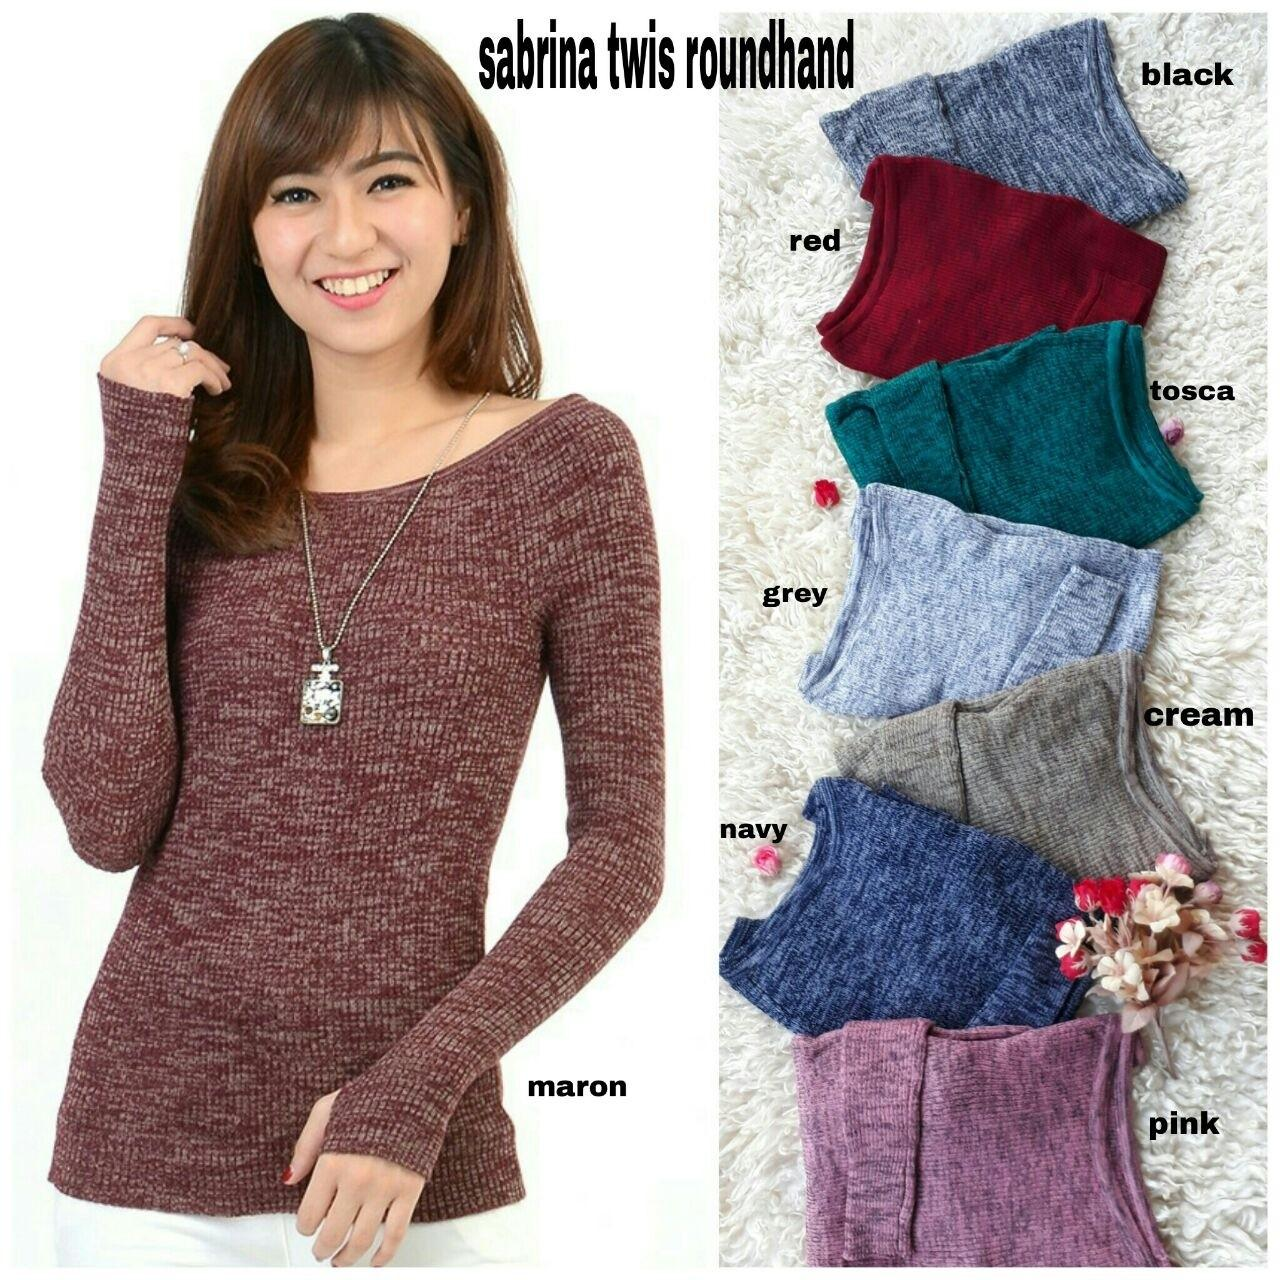 Grand LMS Sweater Sabrina Twis Roundhand 8 Varian Warna Bahan Rajut Stretch Fit to L /